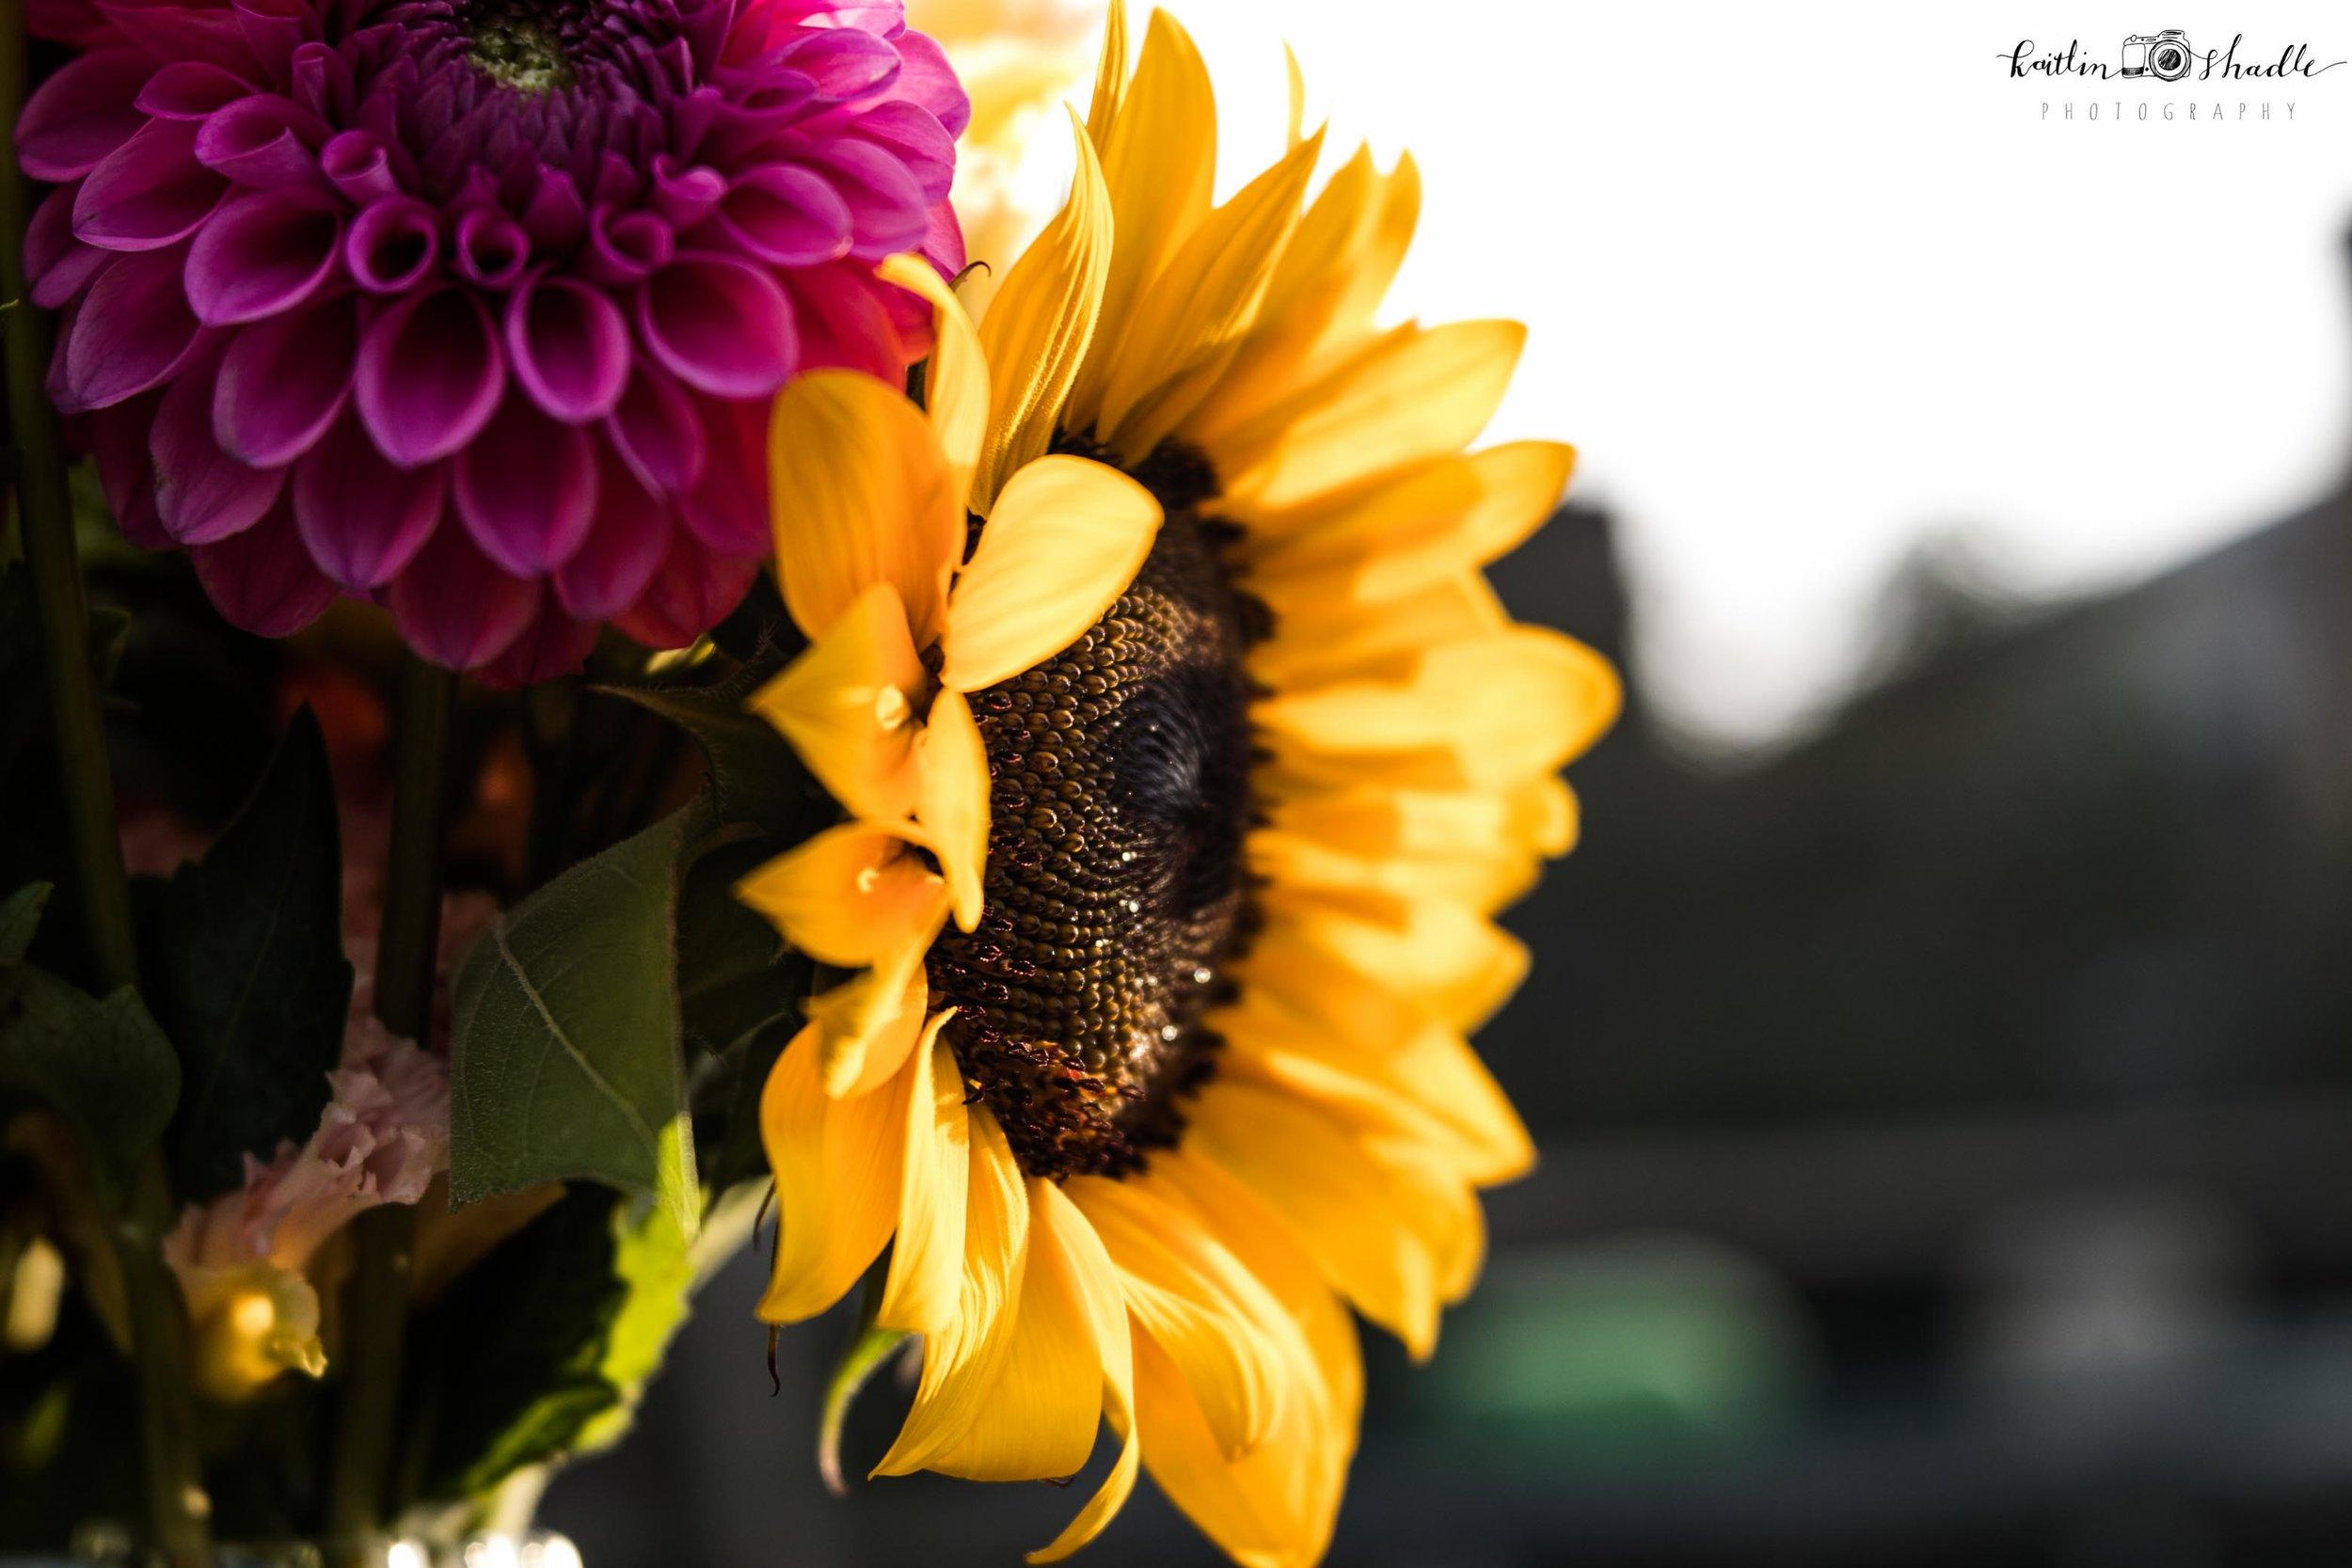 Sunflower in Macro